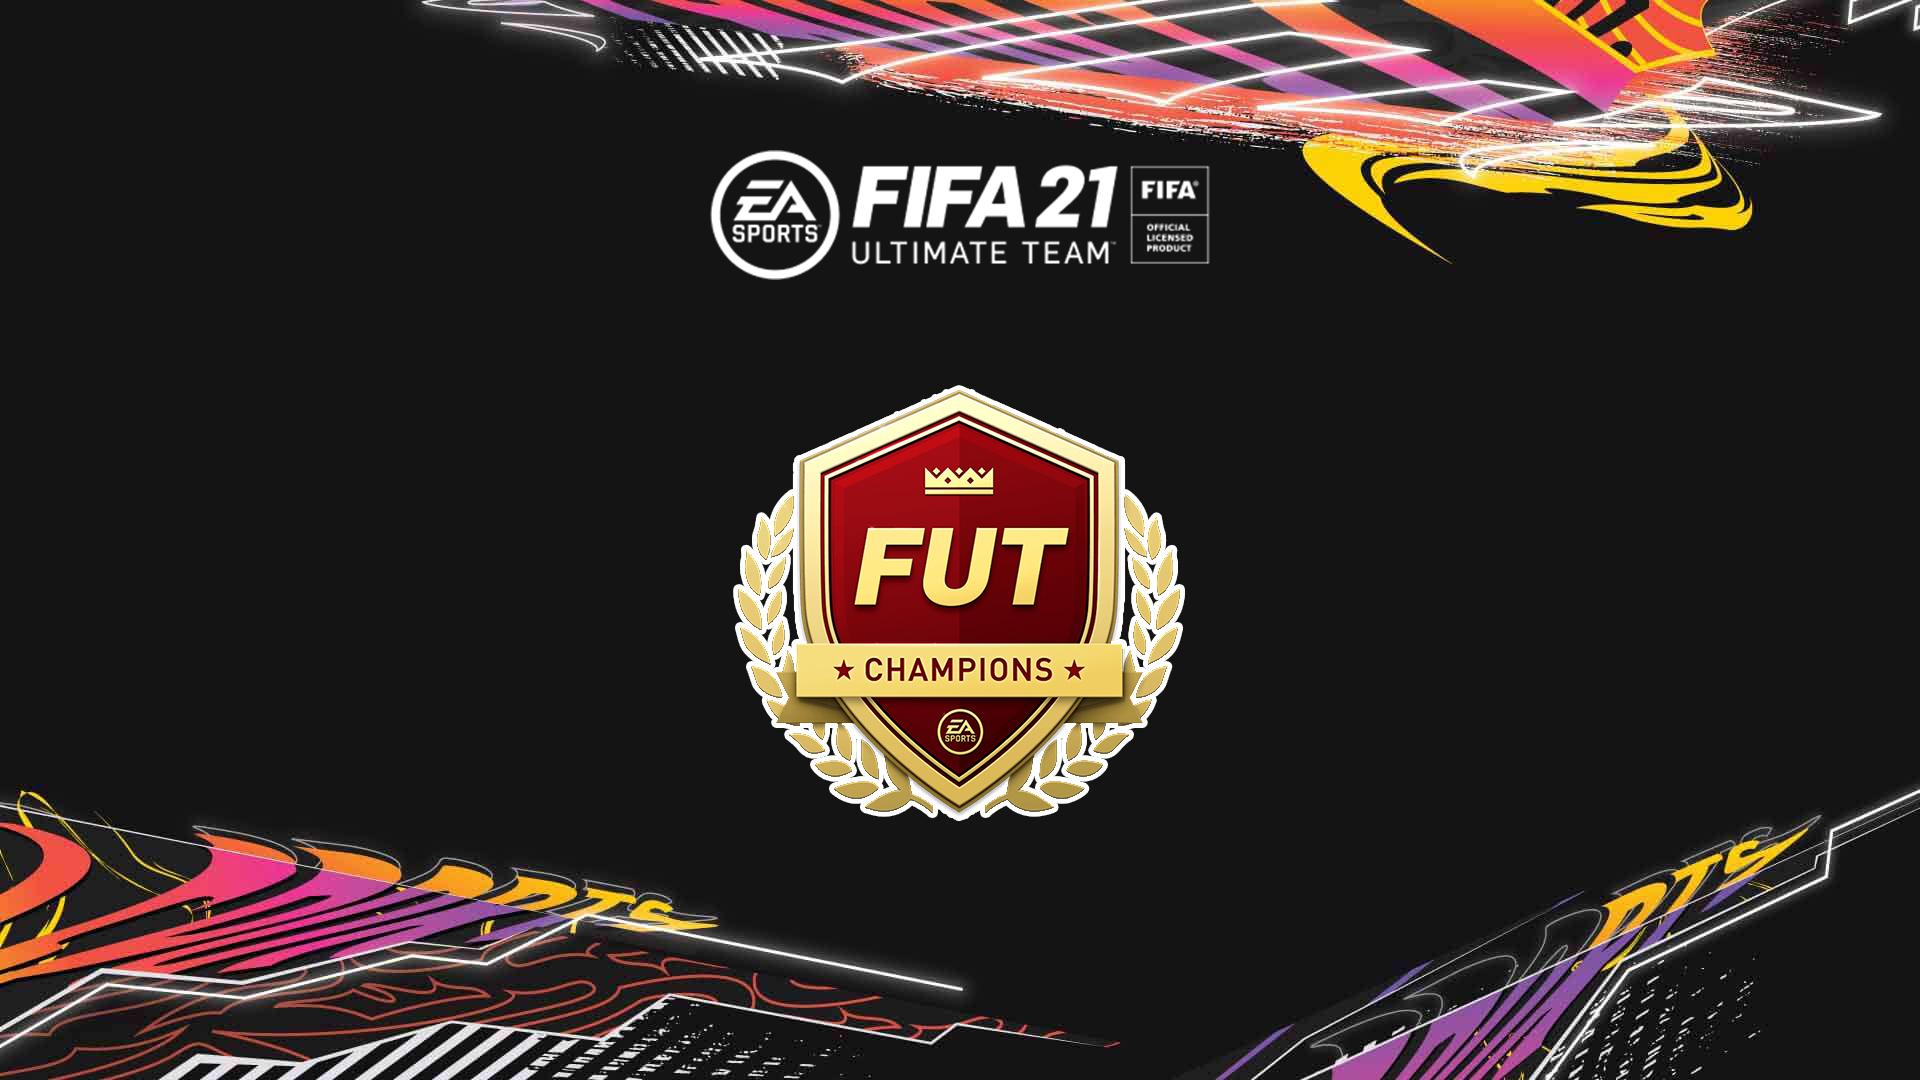 Fifa Ultimate Team FUT Champions FIFA 21 header